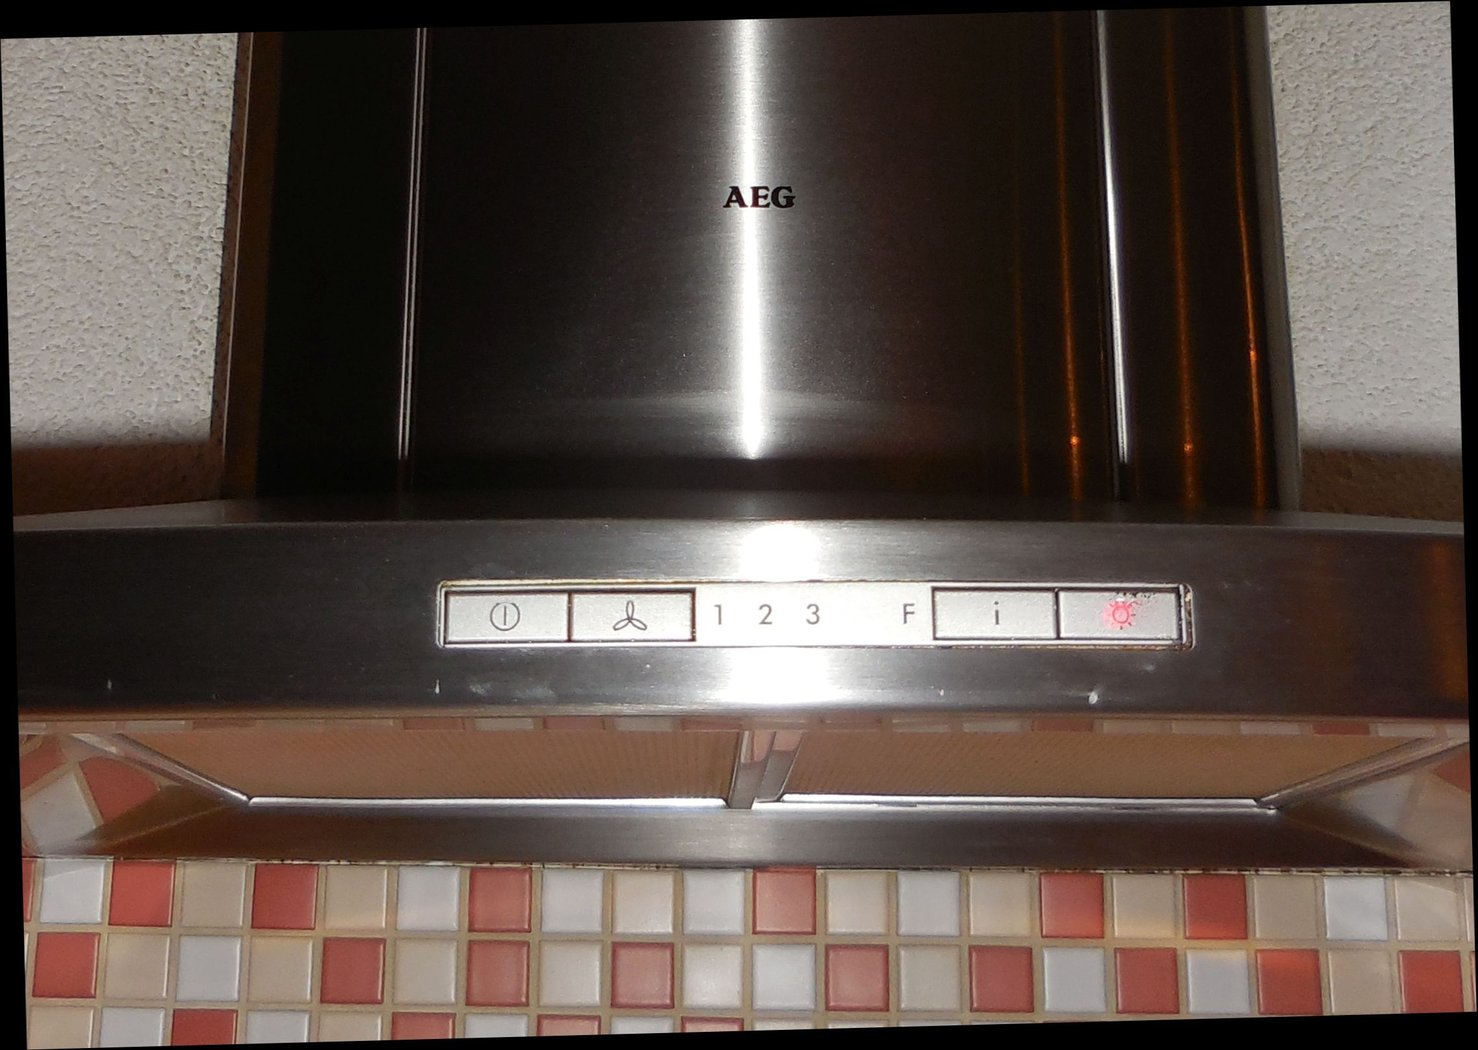 aeg elektronik f r dunsthaube dk9660 steuerung schalter modul. Black Bedroom Furniture Sets. Home Design Ideas